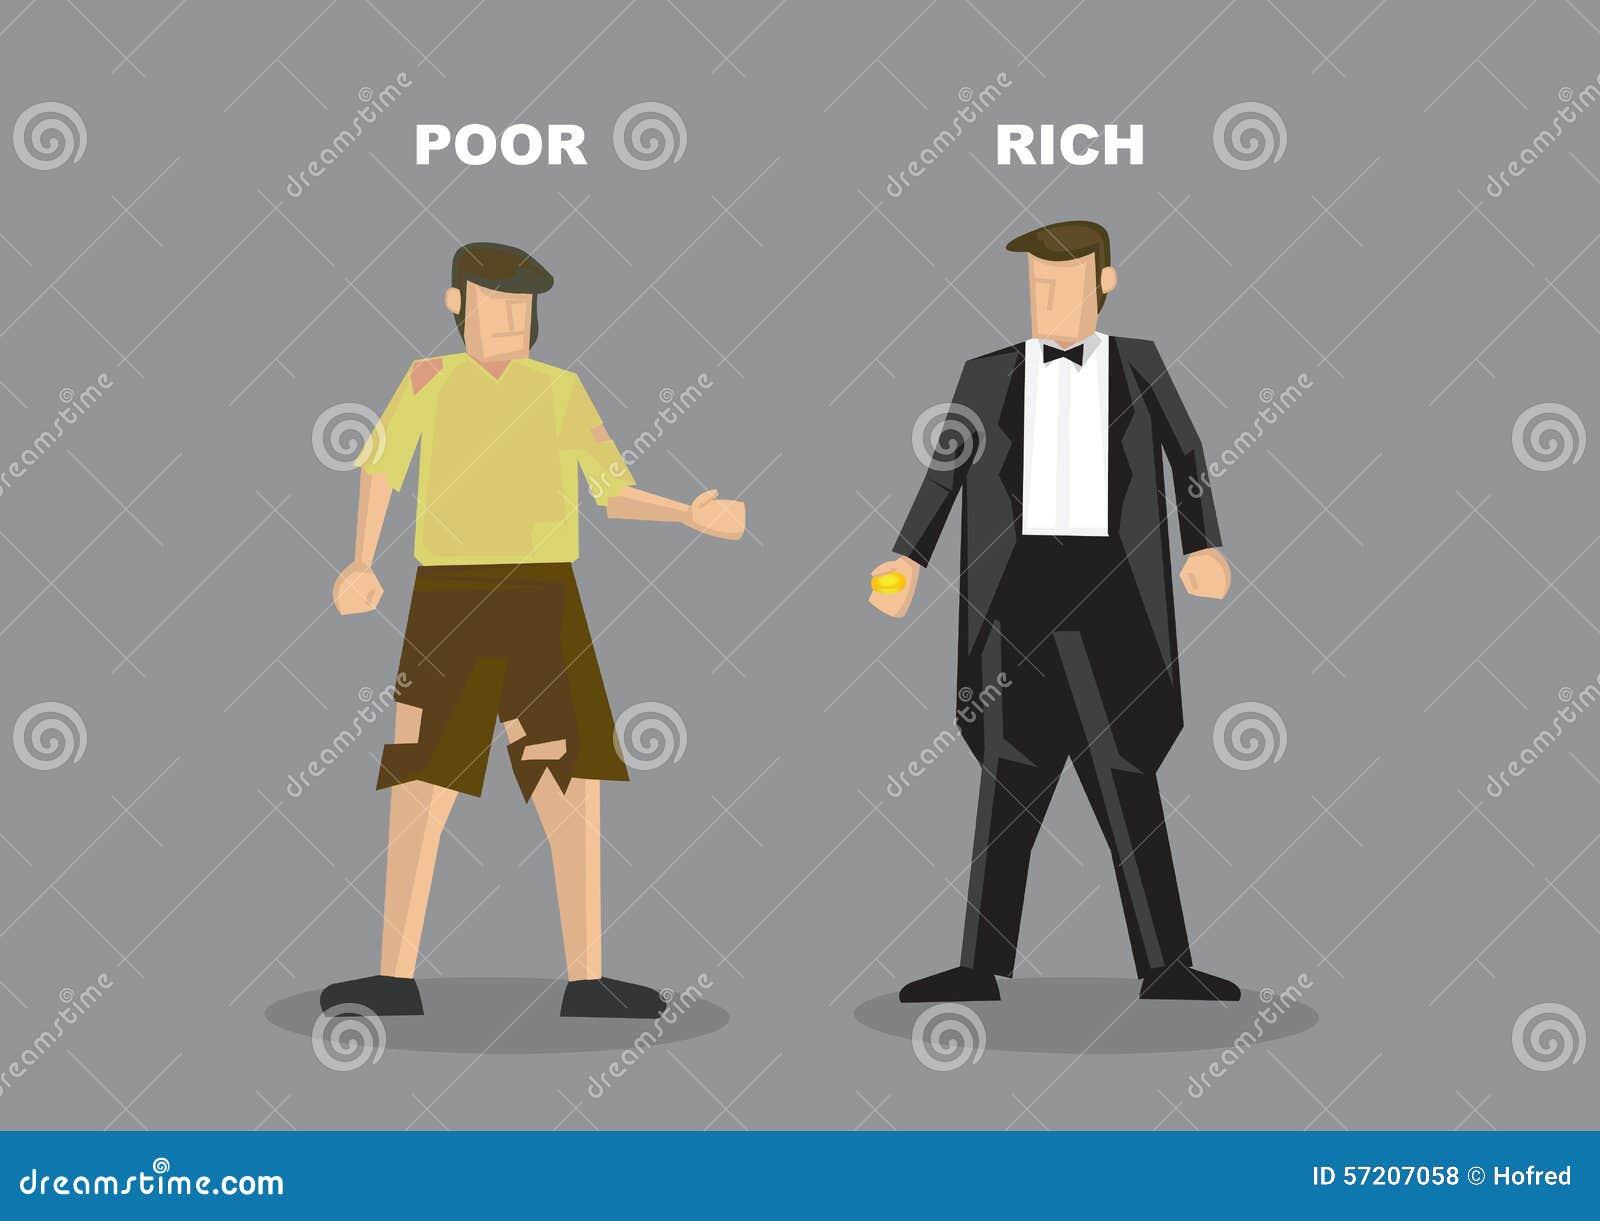 rich vs poor cartoons - photo #25